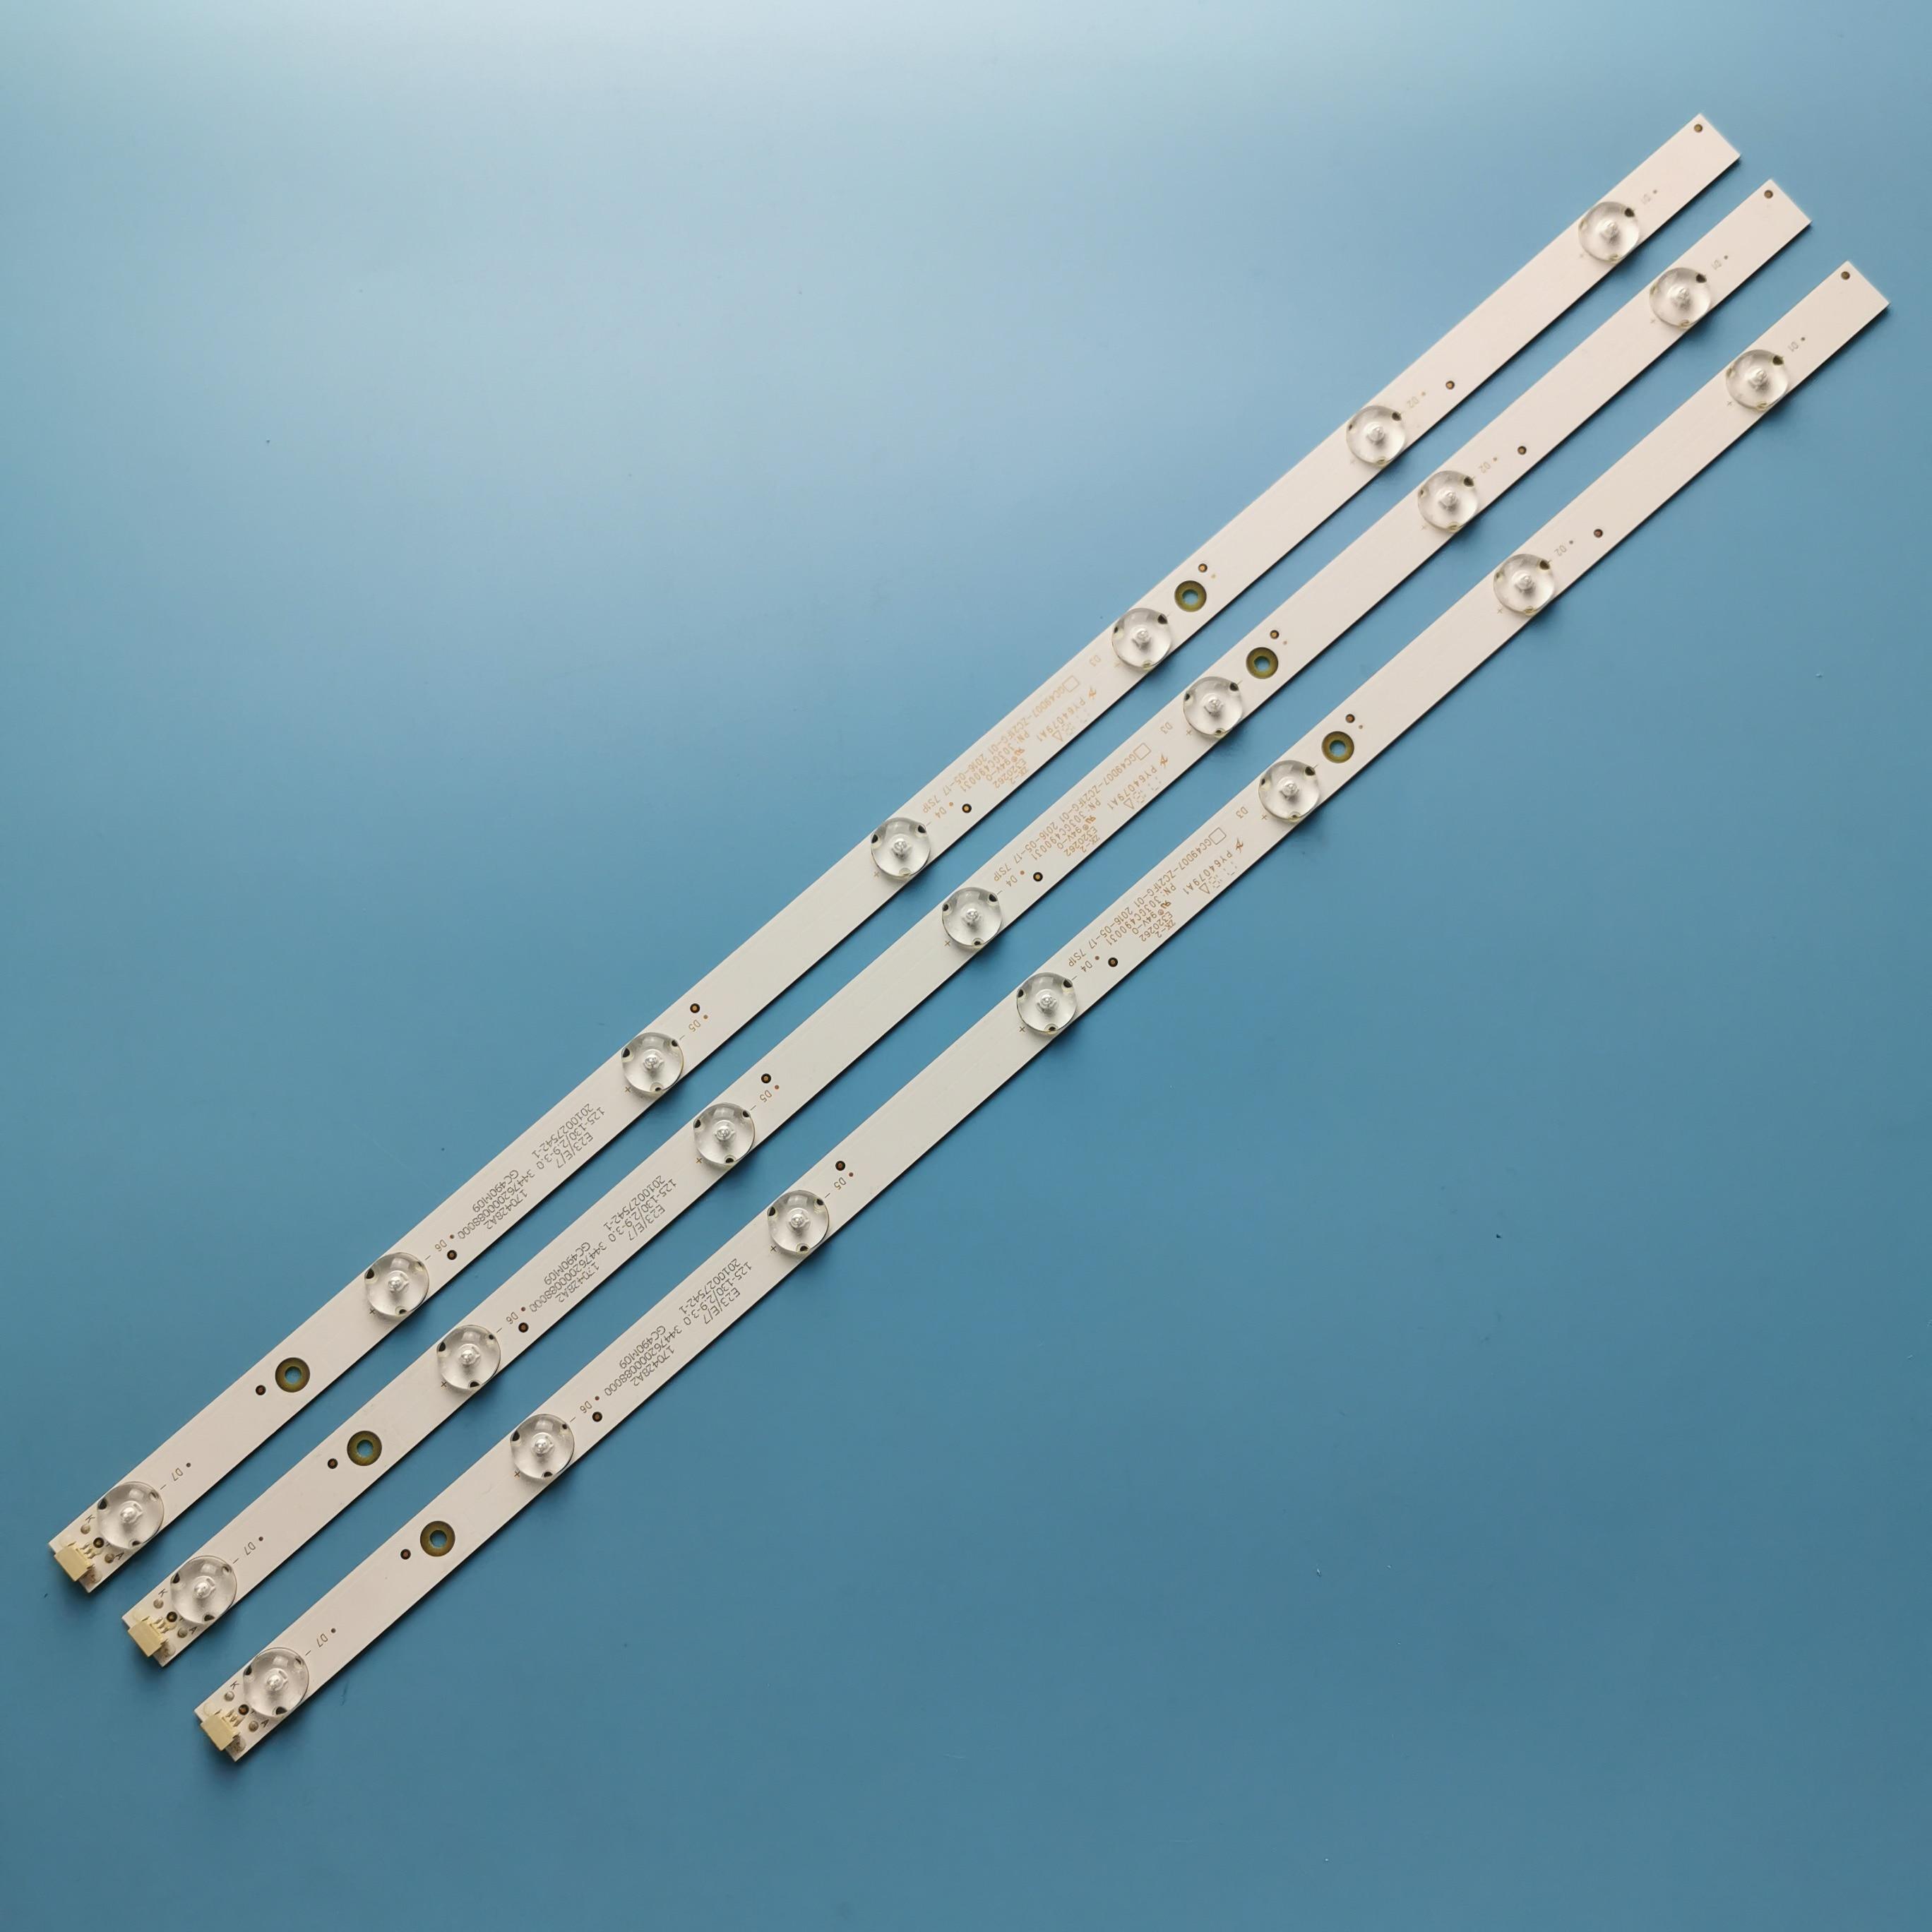 485mm LED Backlight Lamps Strips 7leds For  Philips 49PUF6261/T3 GC49D07-ZC21FG-01 303GC490031 GC490M06